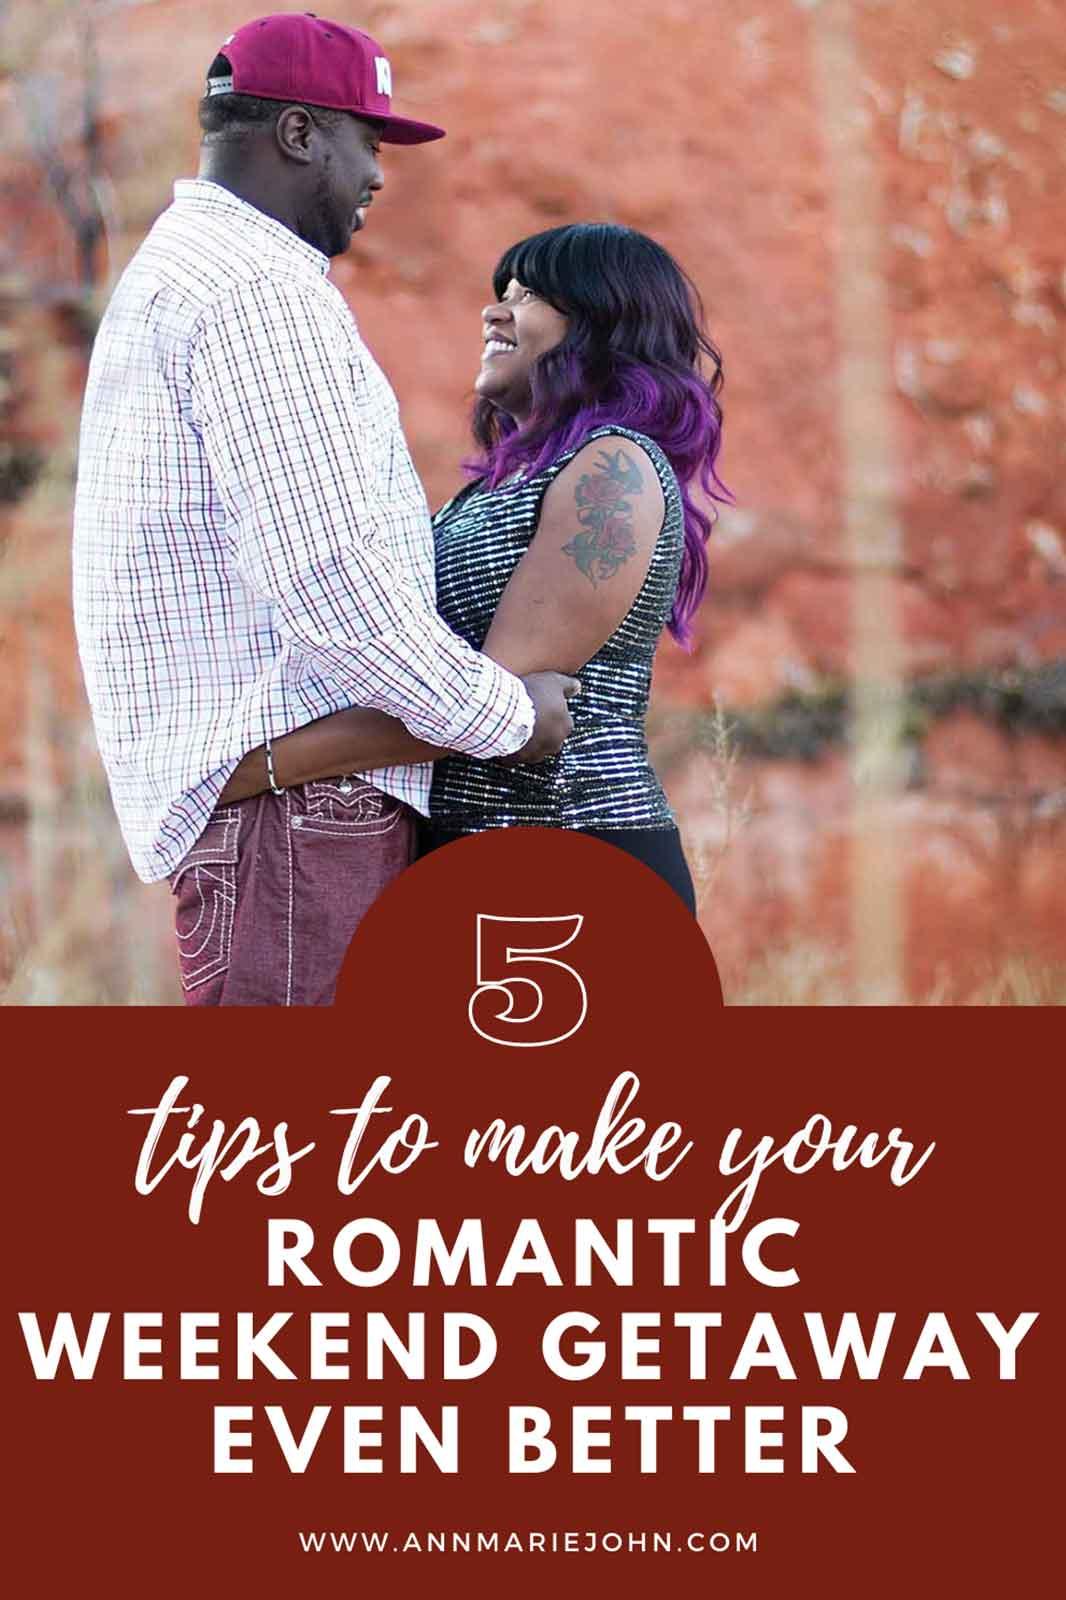 Tips to Make Your Romantic Weekend Getaway Even Better